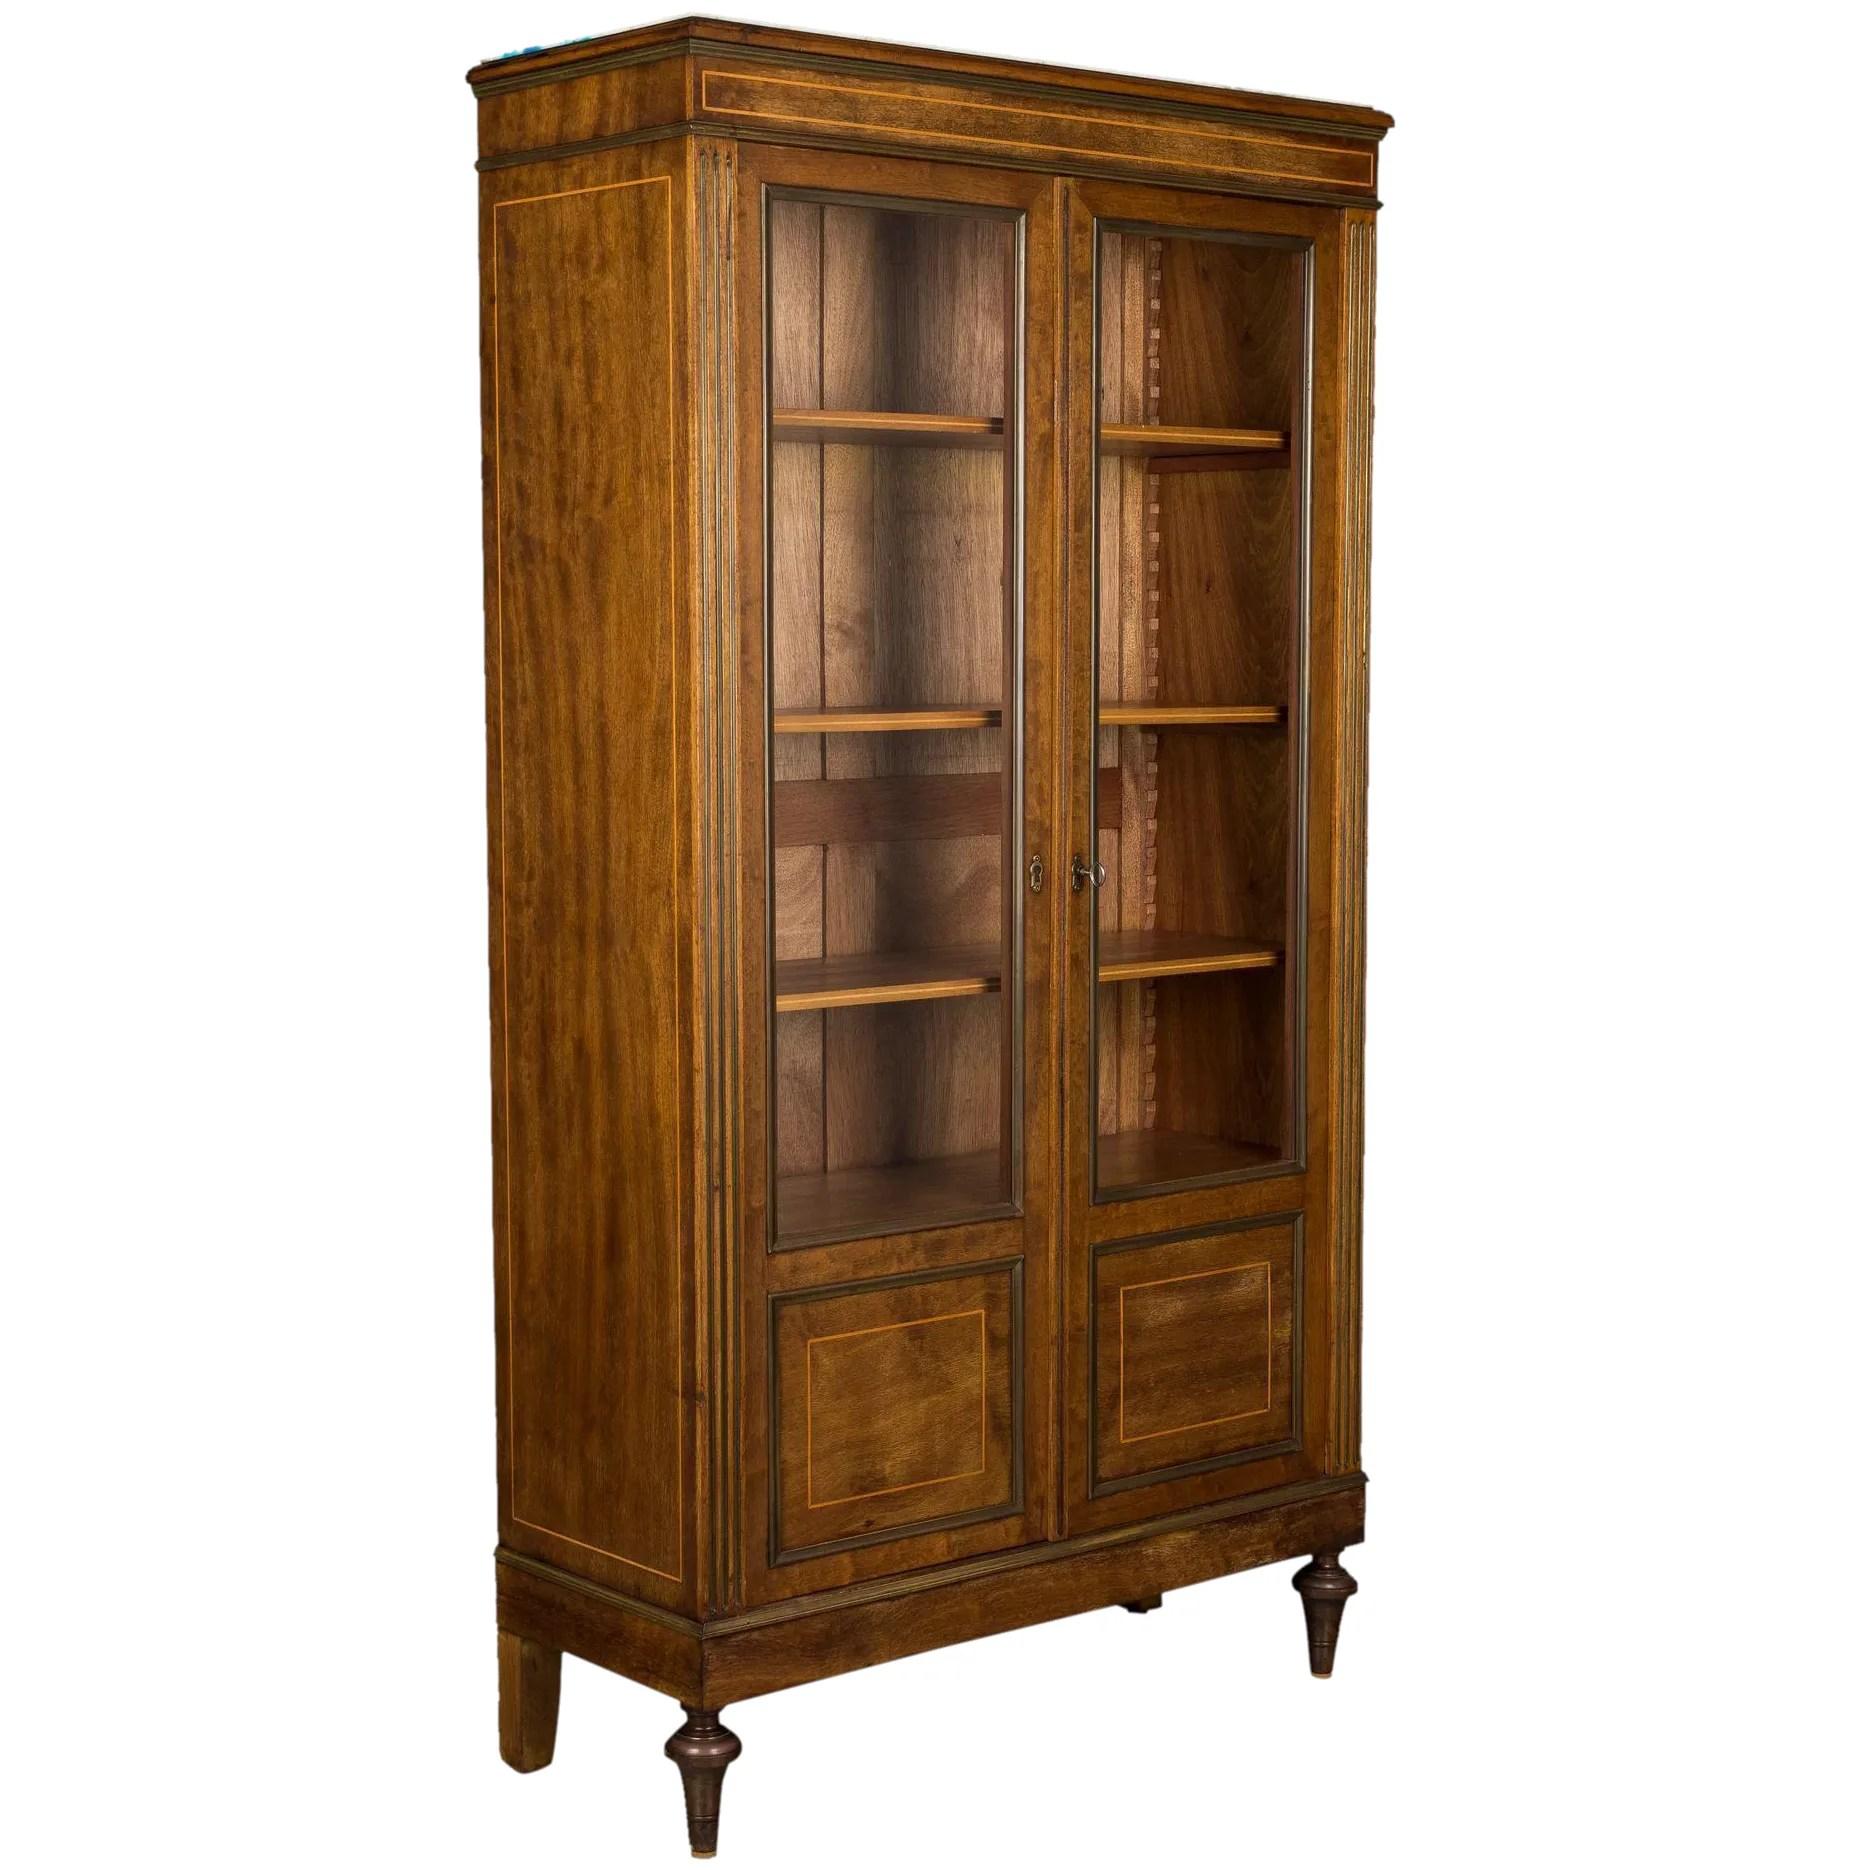 French Louis Xvi Style Bookcase